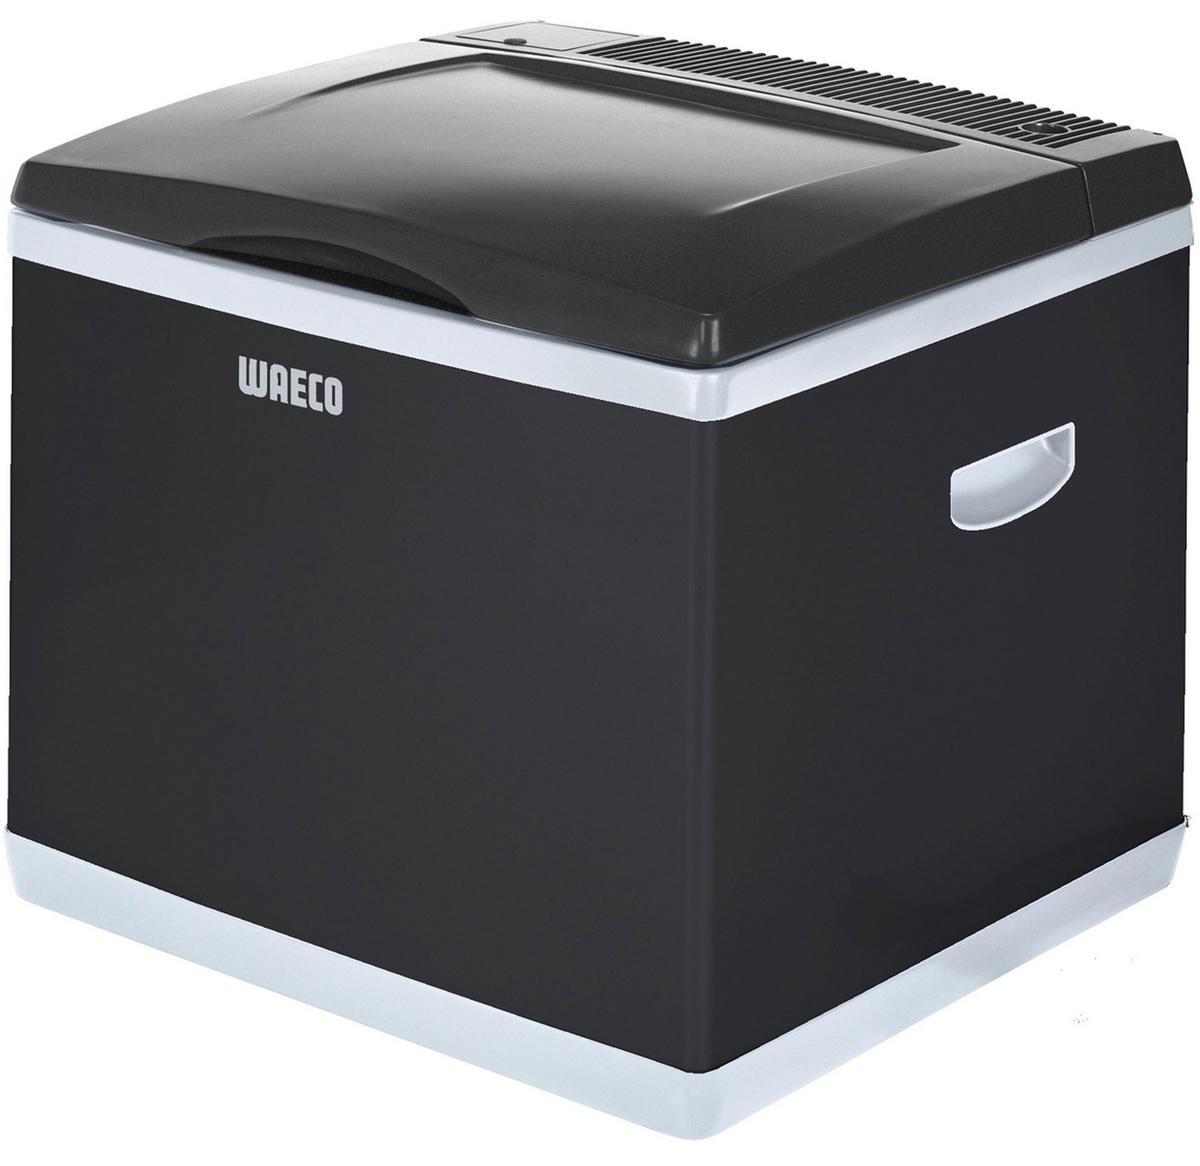 Dometic B40 CK40D 12v/240v Freezer Preview